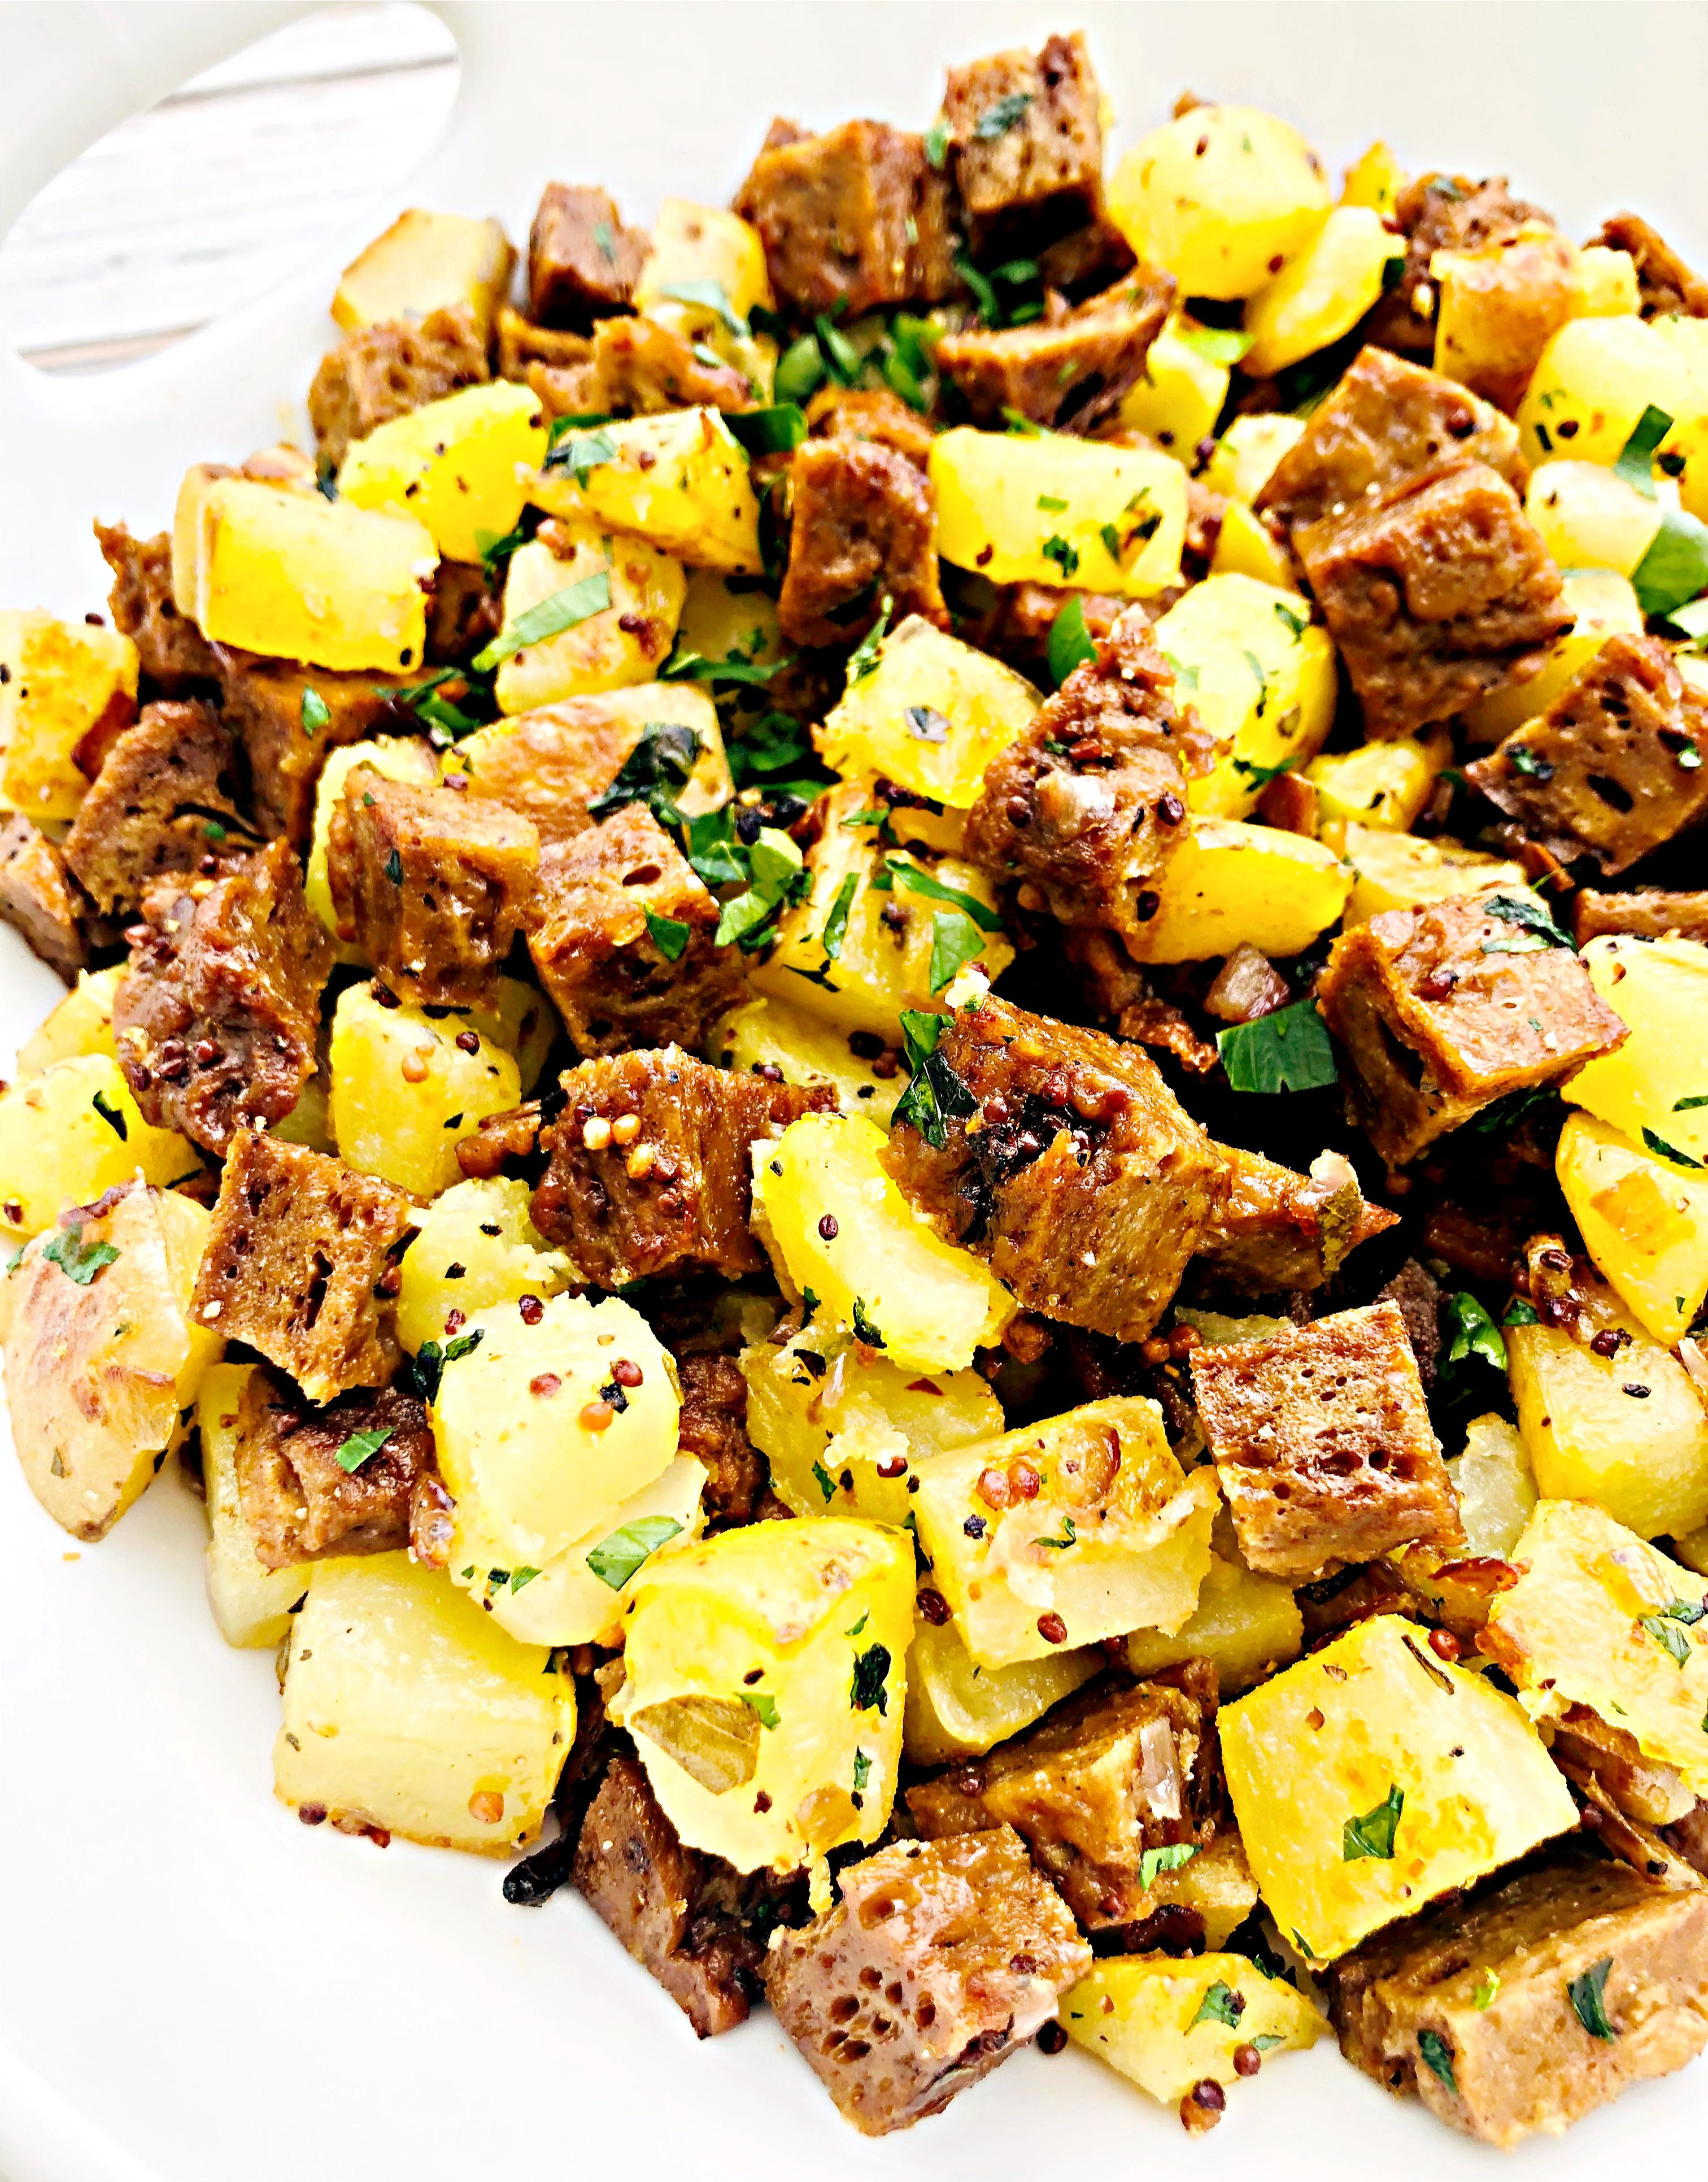 Vegan Corned Seitan Hash - a plant-based alternative to corned beef hash!   #veganrecipes #seitanrecipes #veganleftovers #veganstpatricksdayfood #veganhash #thiswifecooksrecipes #easyveganrecipes #easyplantbasedrecipes via @thiswifecooks